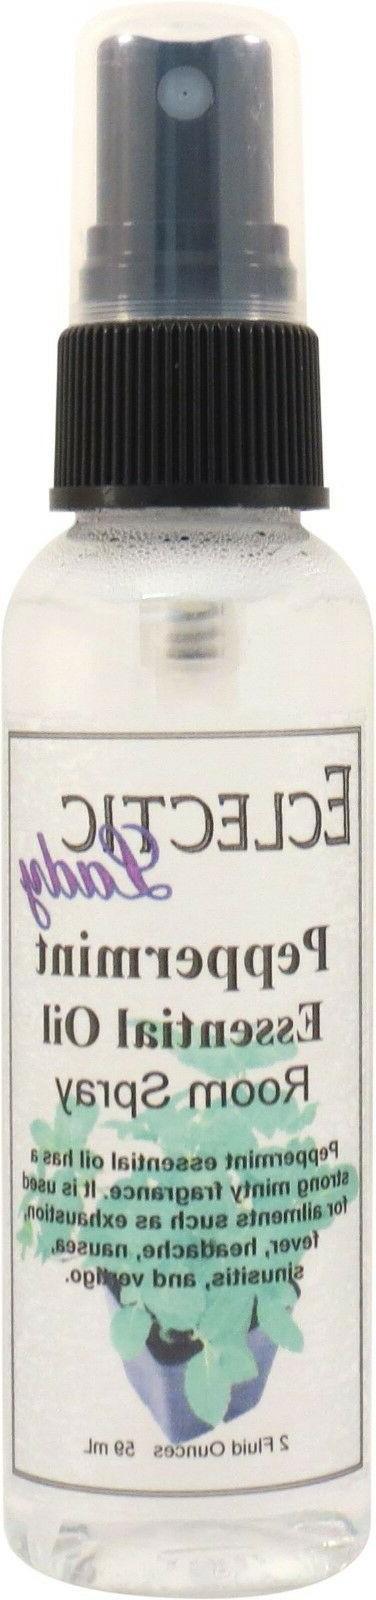 peppermint essential oil room spray